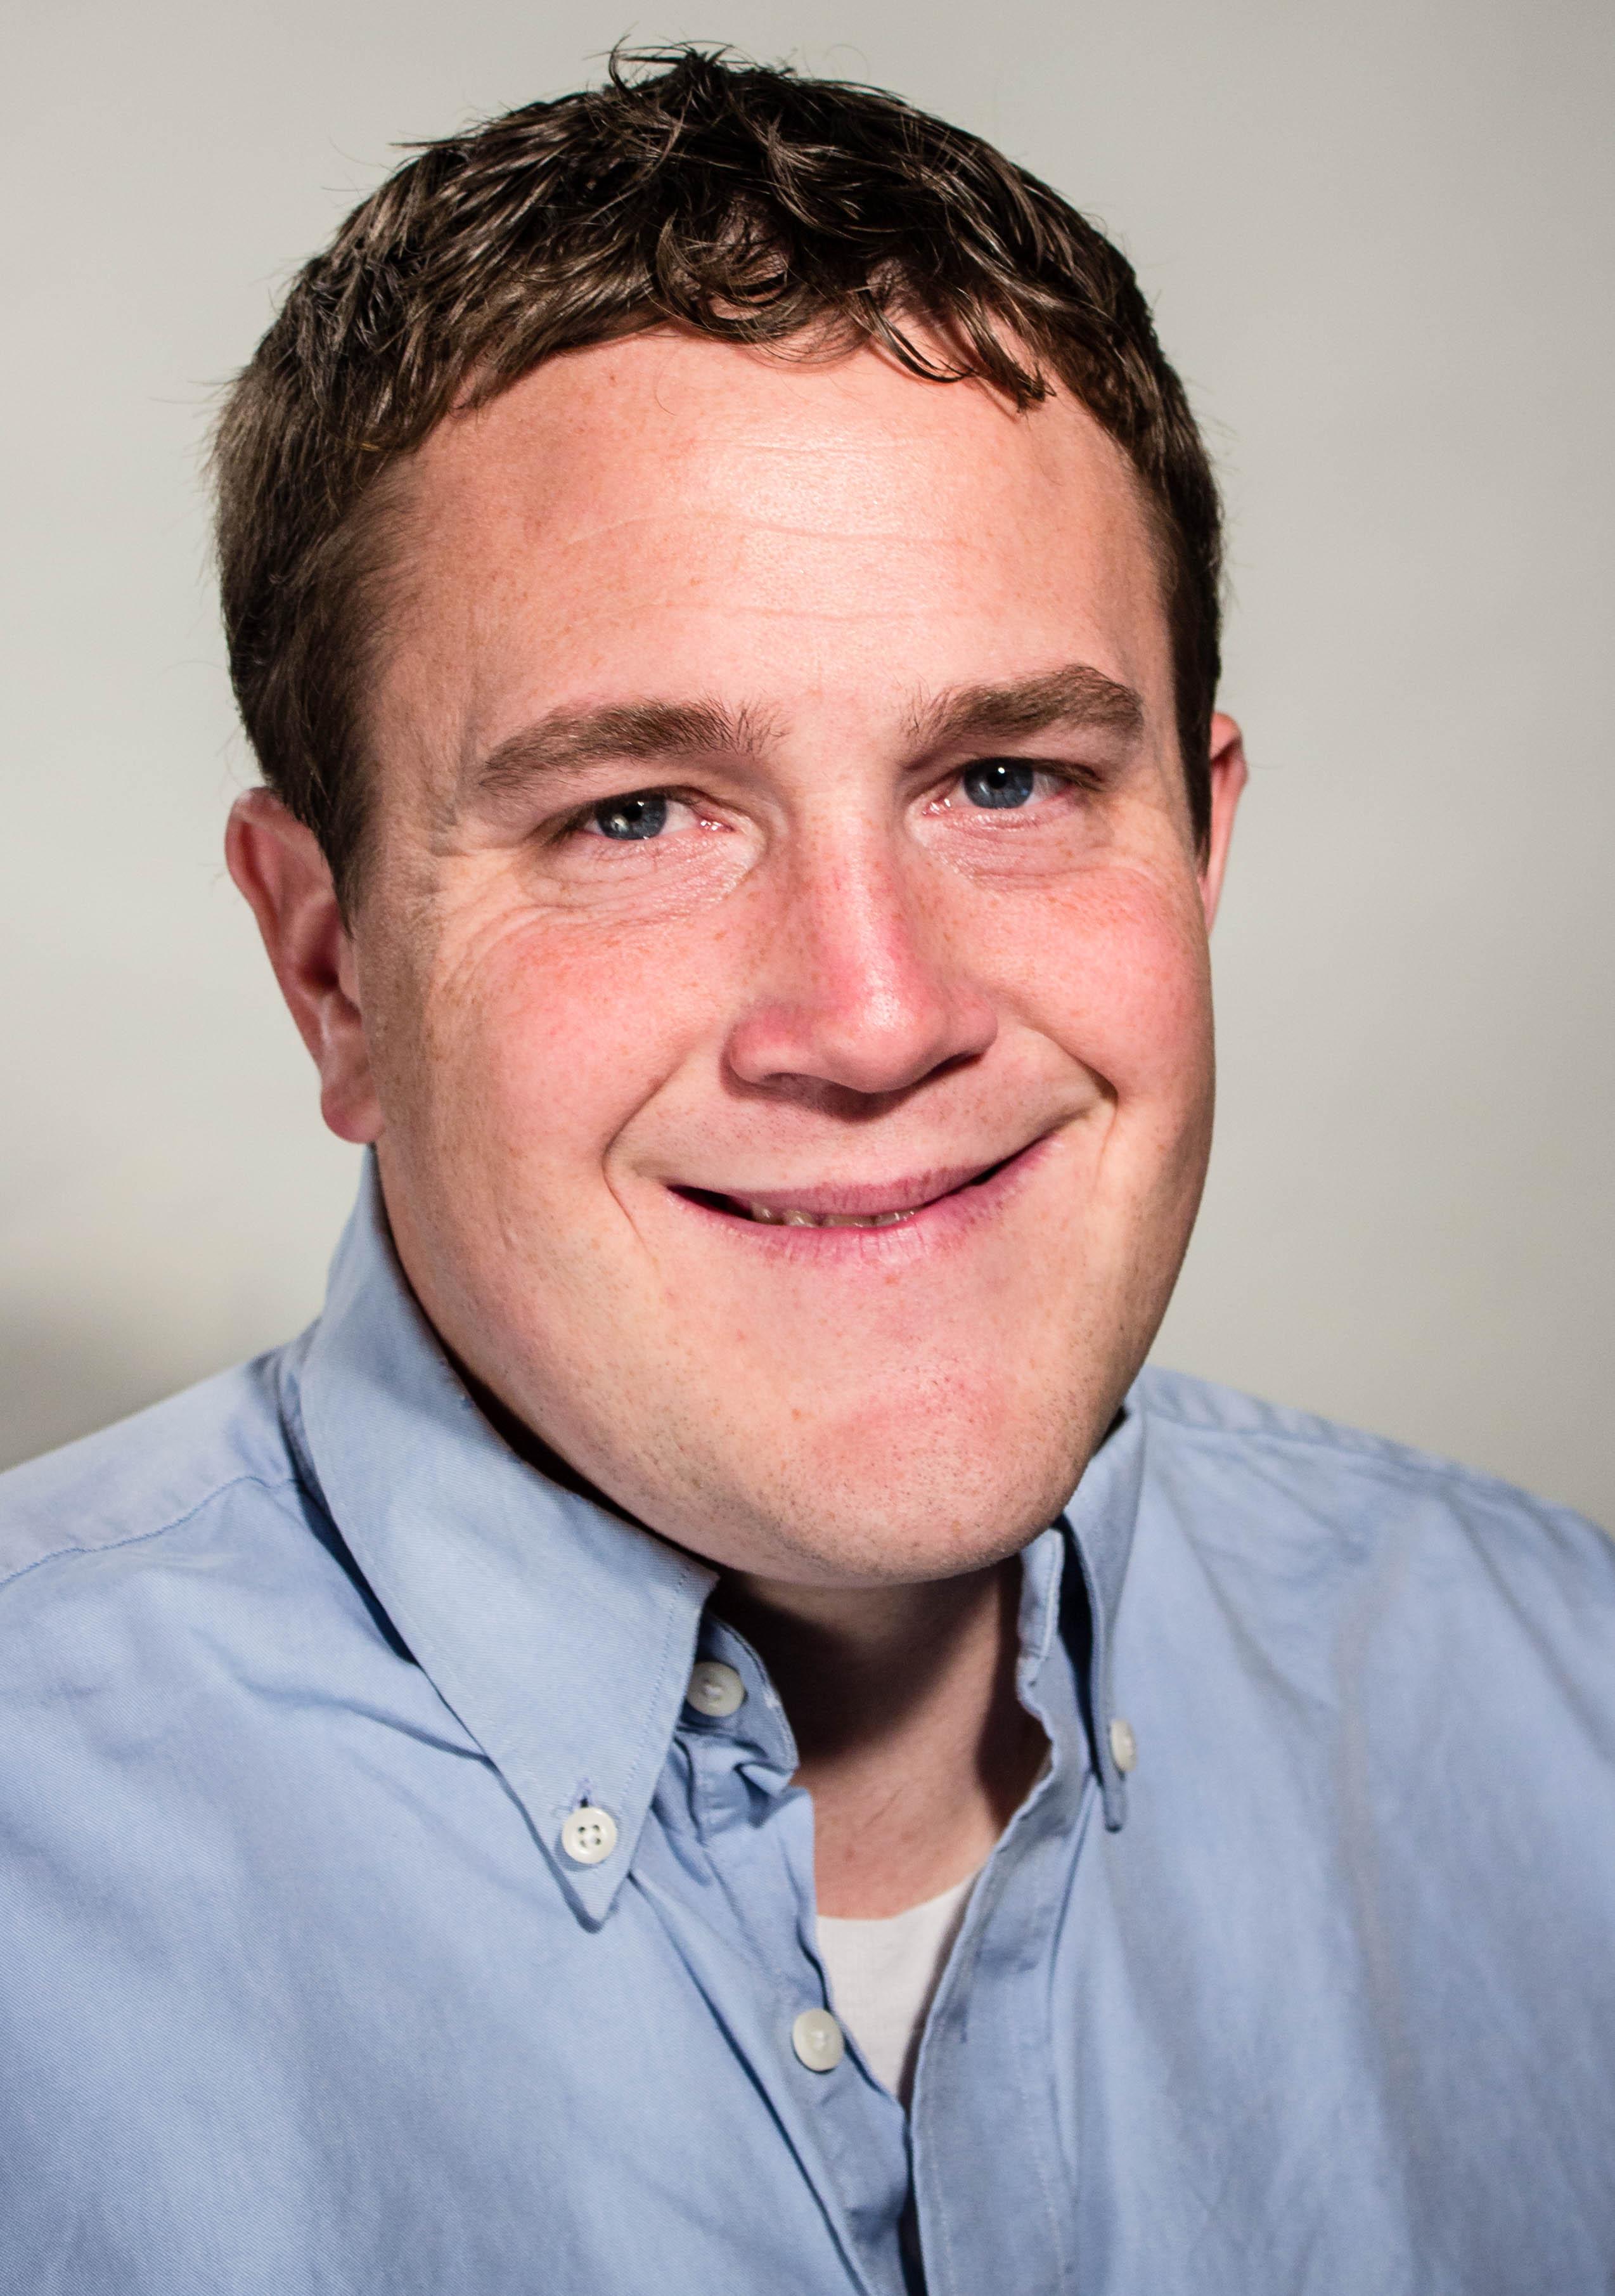 Matthew Hickenlooper